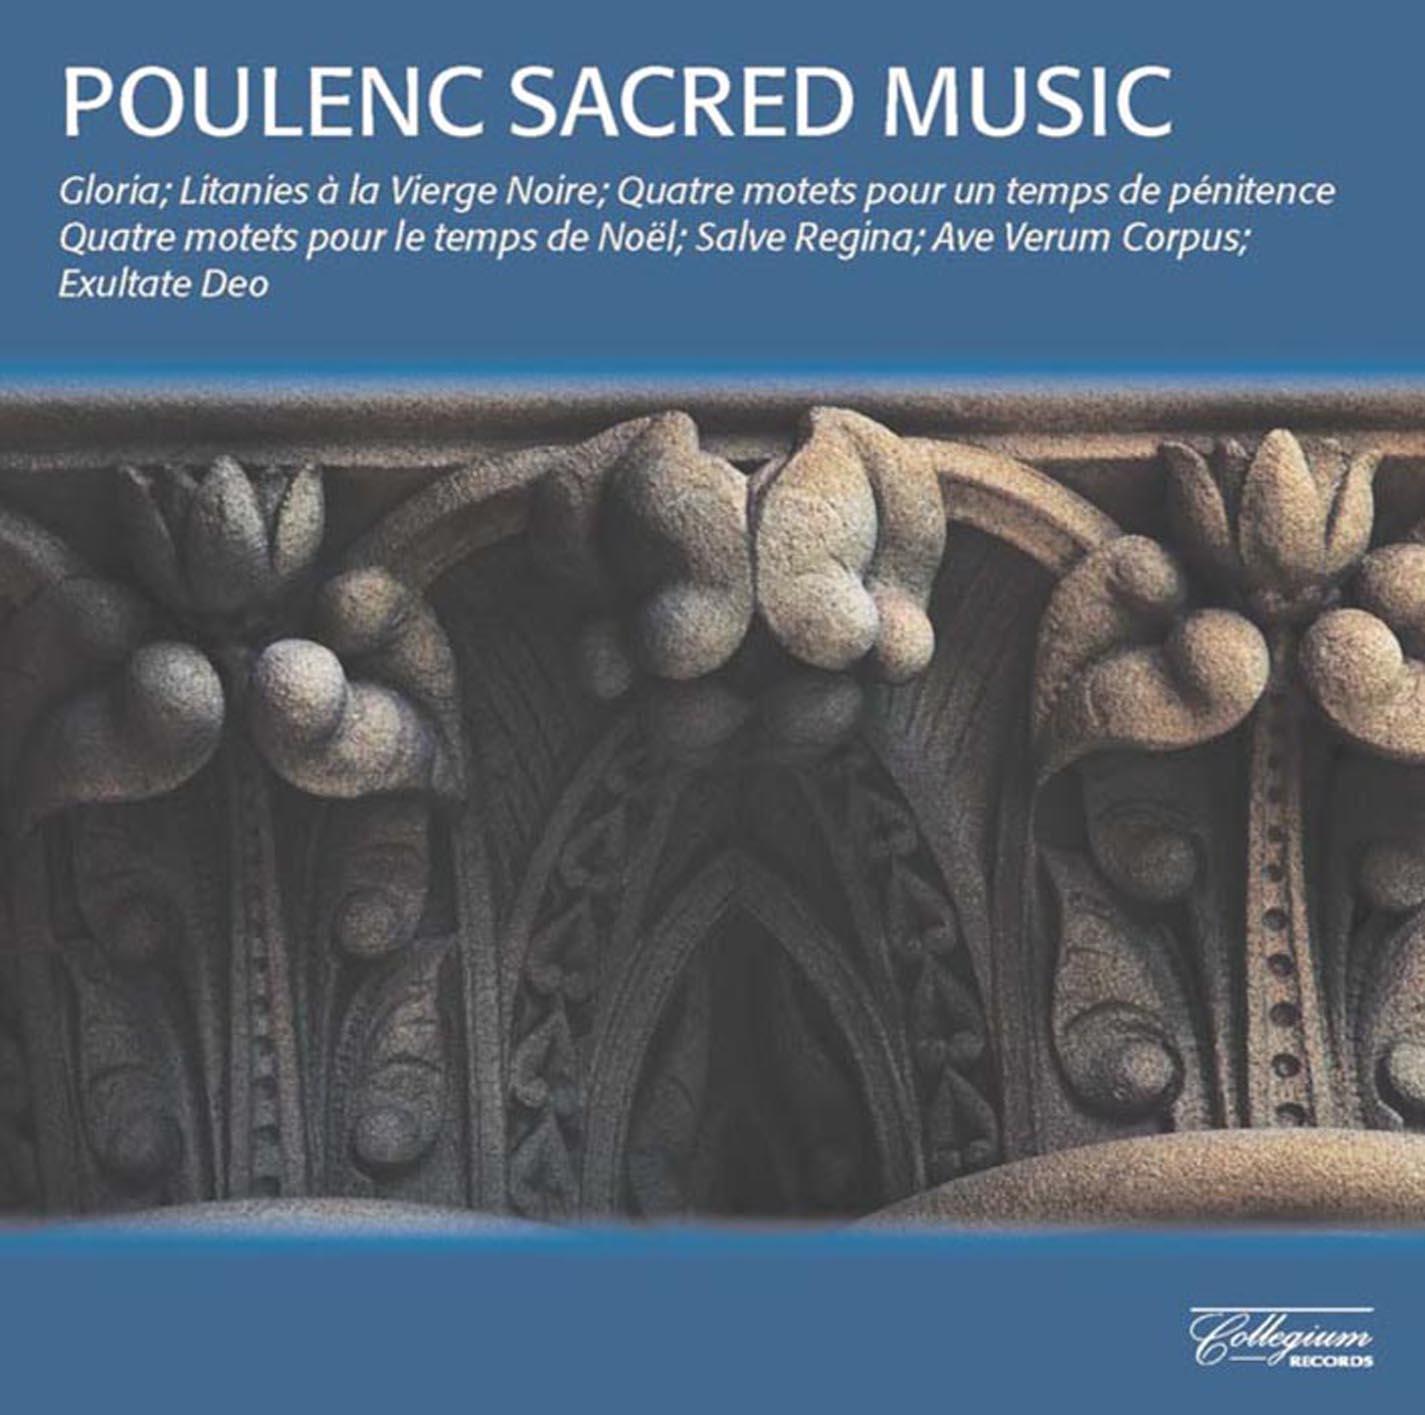 Poulenc Sacred Music